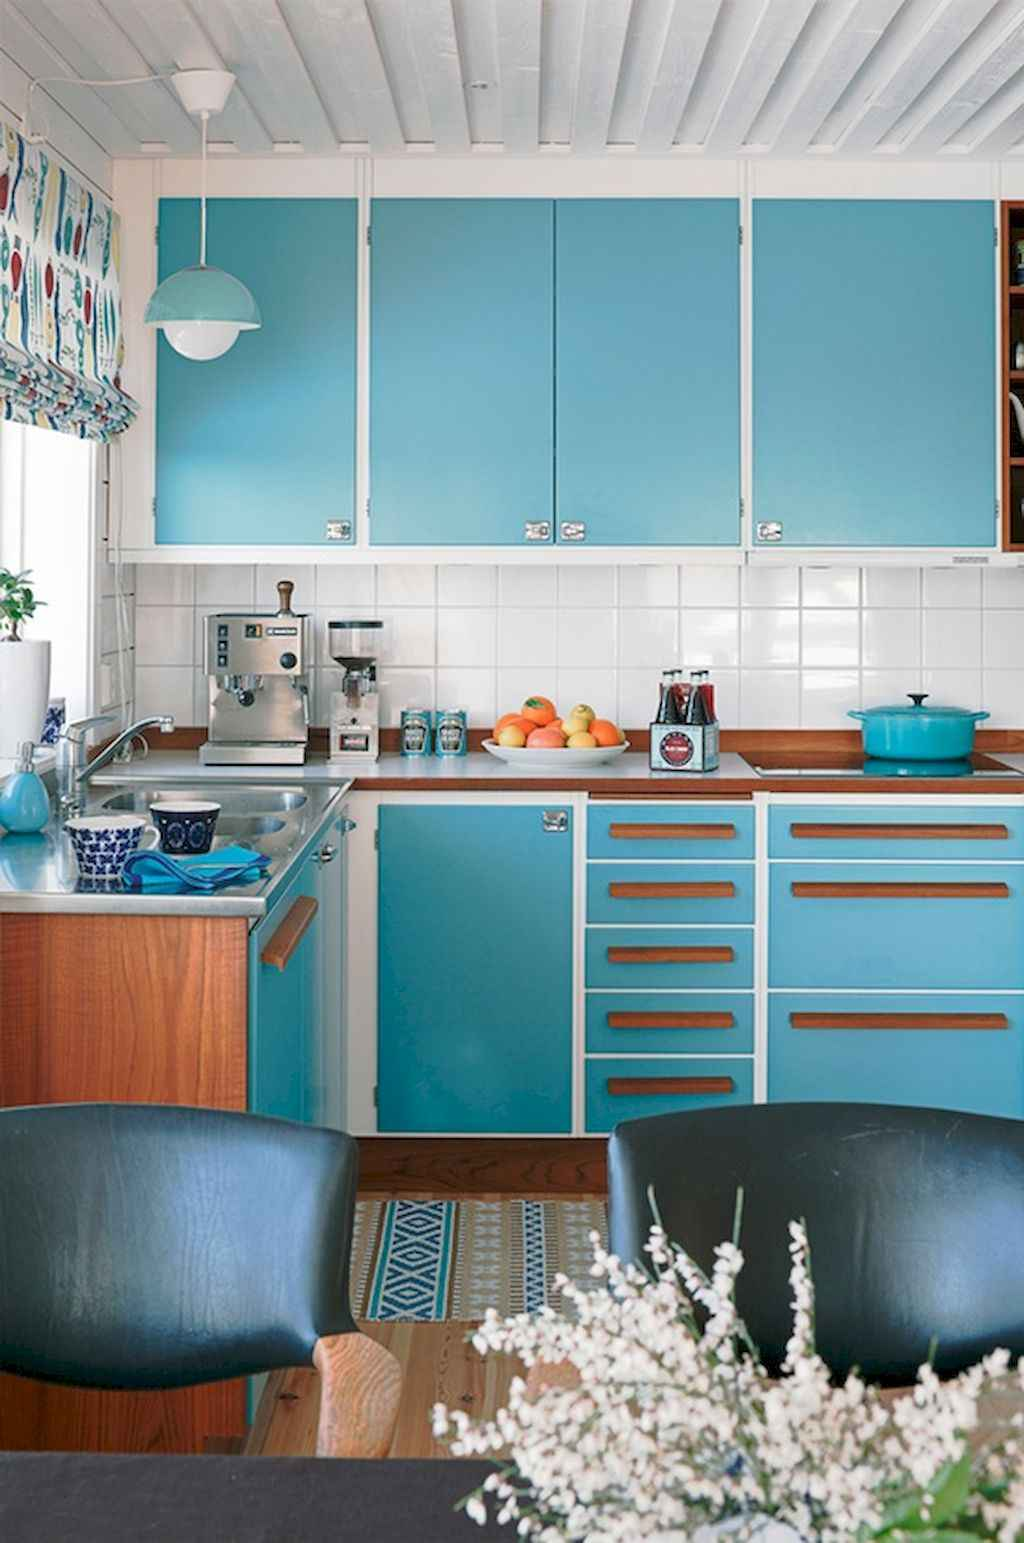 Mid century modern kitchen design ideas (6)